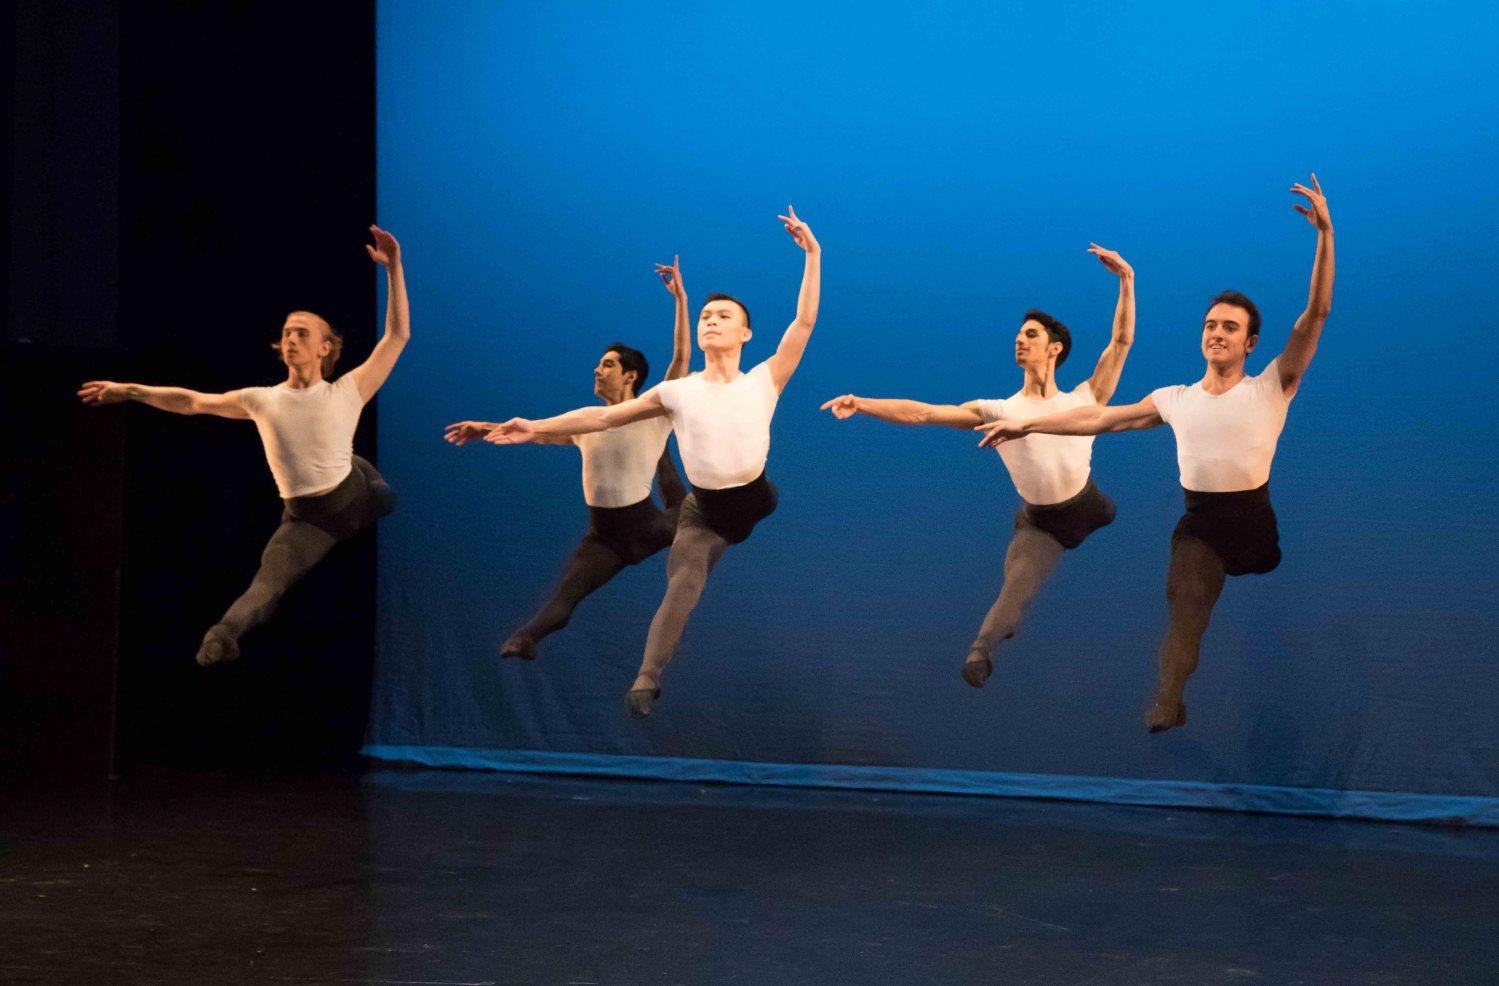 Ellison Ballet, Ballet Academy East Student Performances, Vilhelm Bjerser--Nicholas Moreno Ciblis-Kevin Zong--Forrest Oliveros--Juan Cruz Luque-Offenbach-Adagio-5-20-2016-twitter